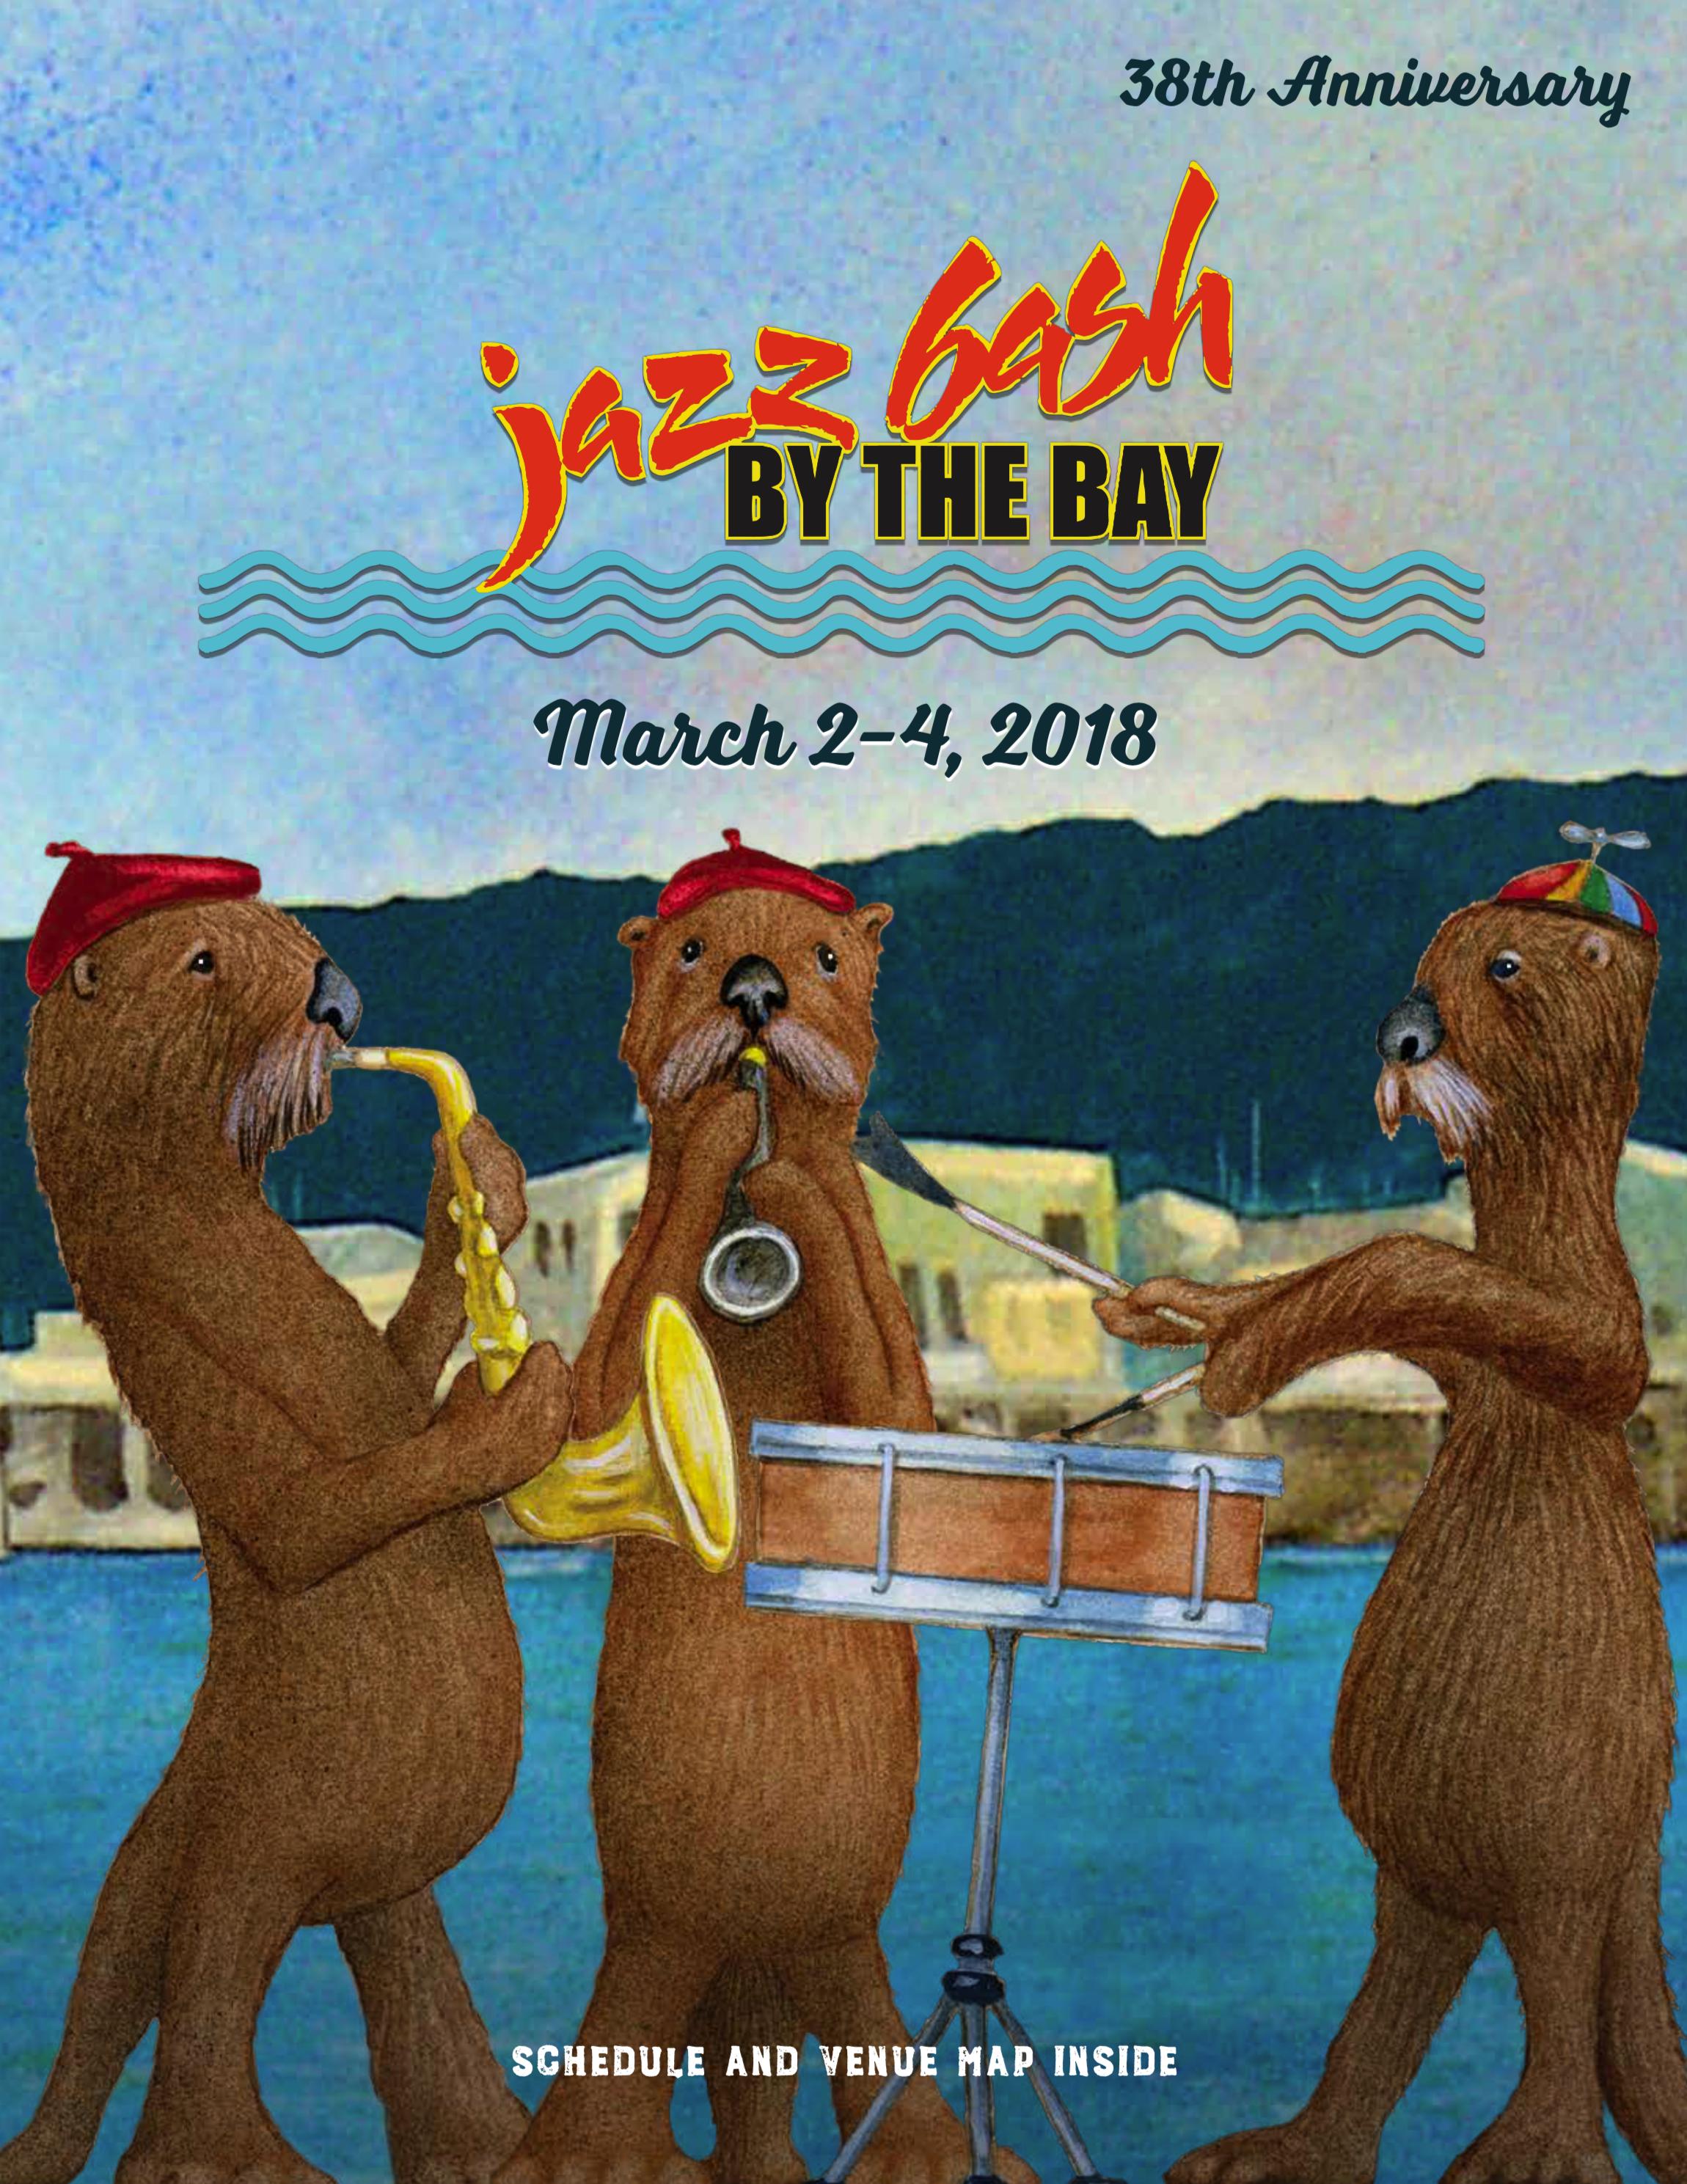 Jazz Bash by the Bay 38th Anniversary Program